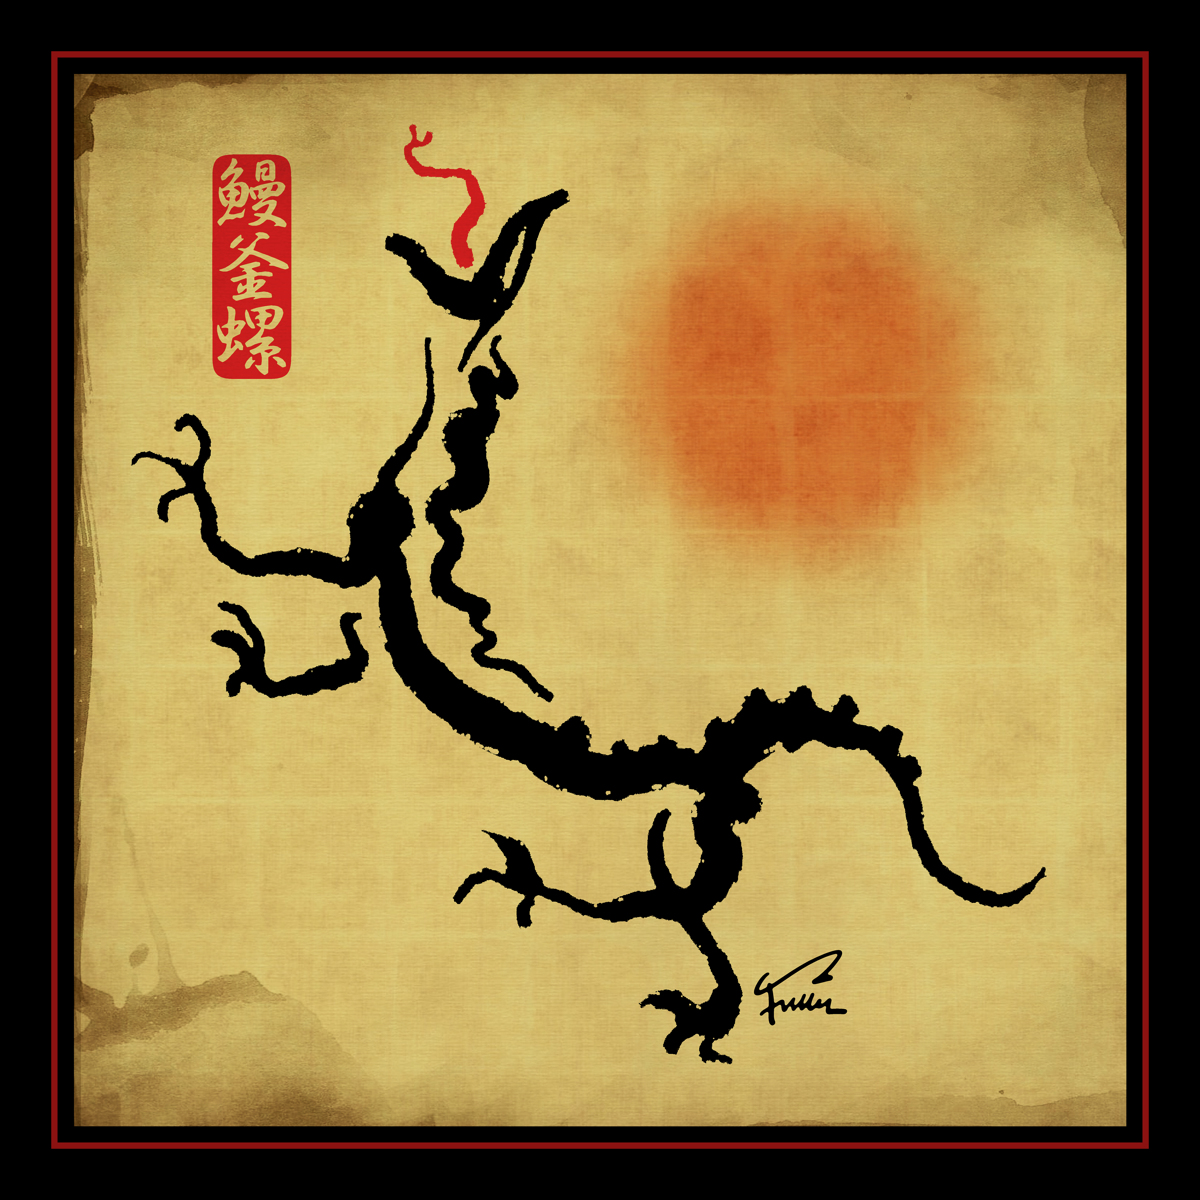 Salamander Dragon and Red Sun (large view)